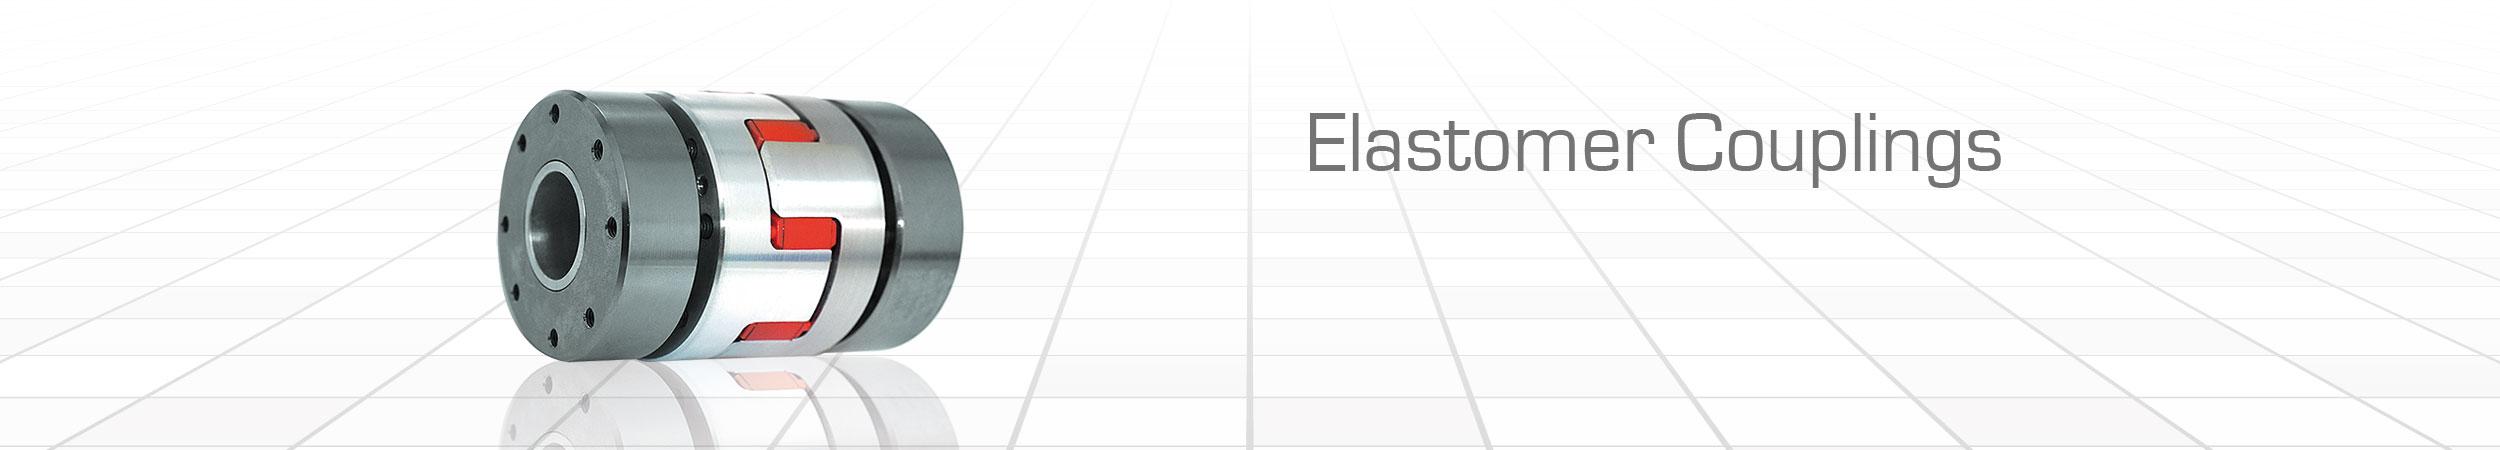 Elastomer Couplings